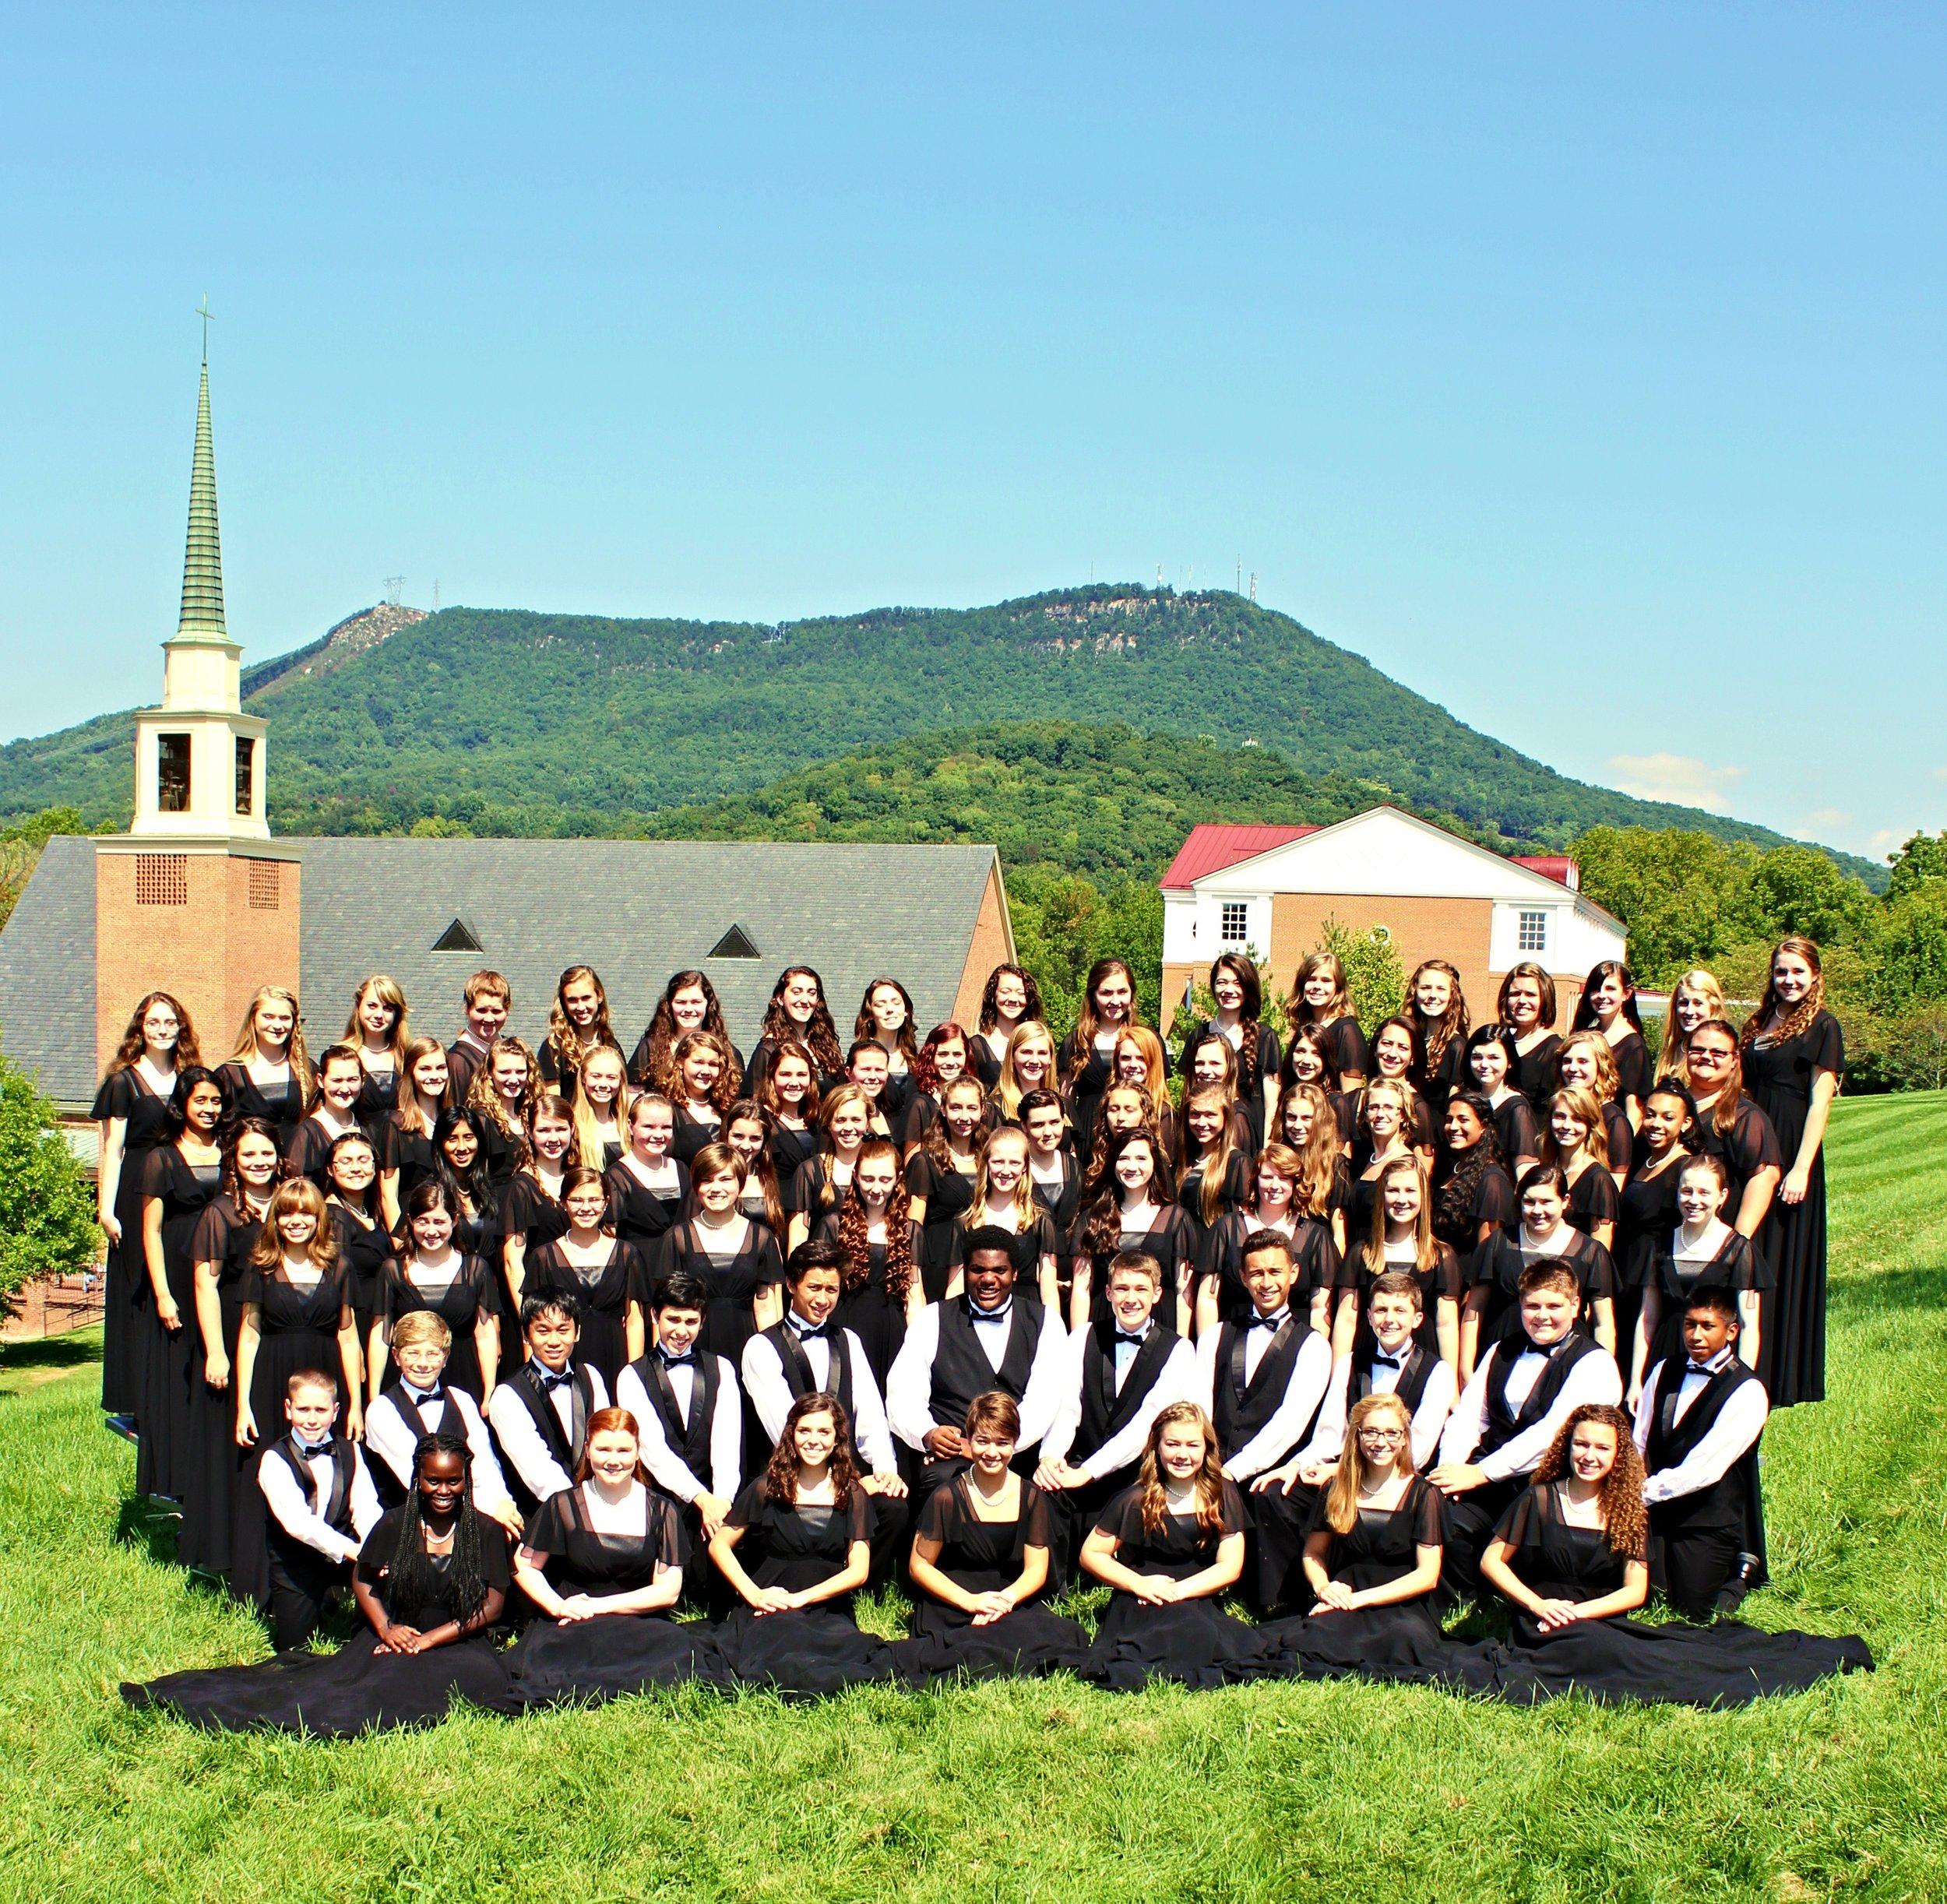 C Choir ACDA Formals 2015 (27) 2.jpg